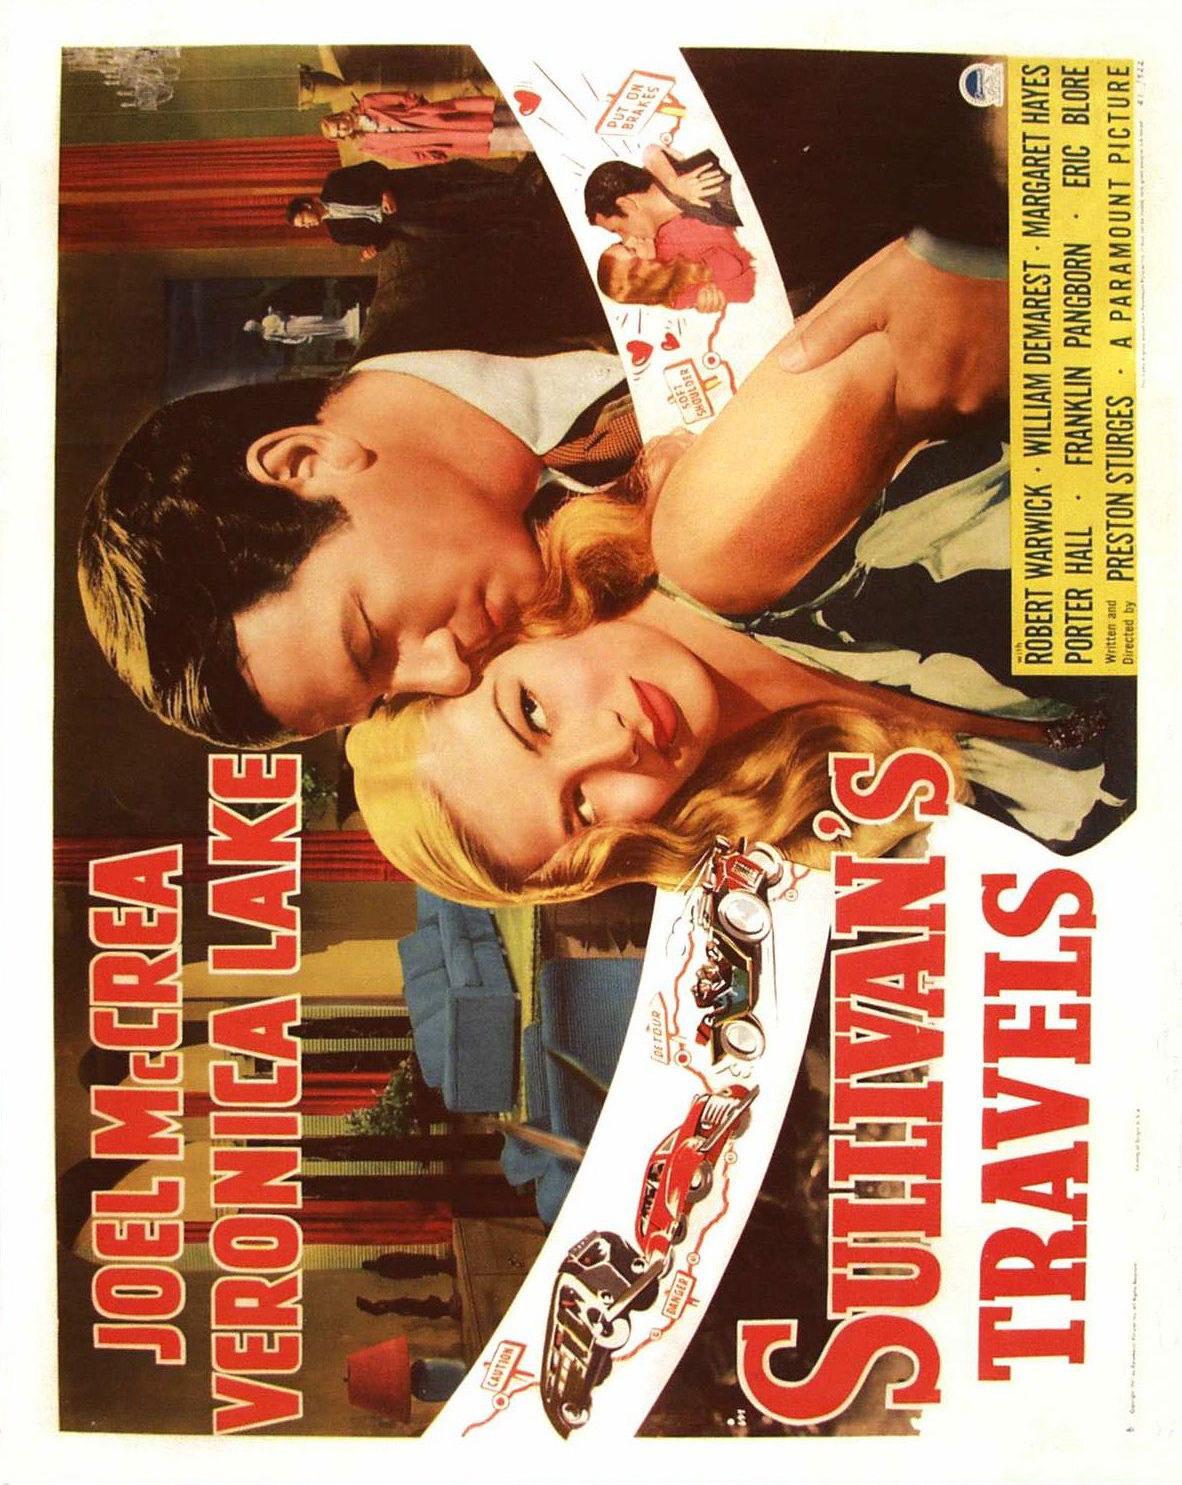 73354 SULLIVANS TRAVELS Movie 1941 RARE FRAMED CANVAS PRINT Toile Toile Toile 4e9f1e